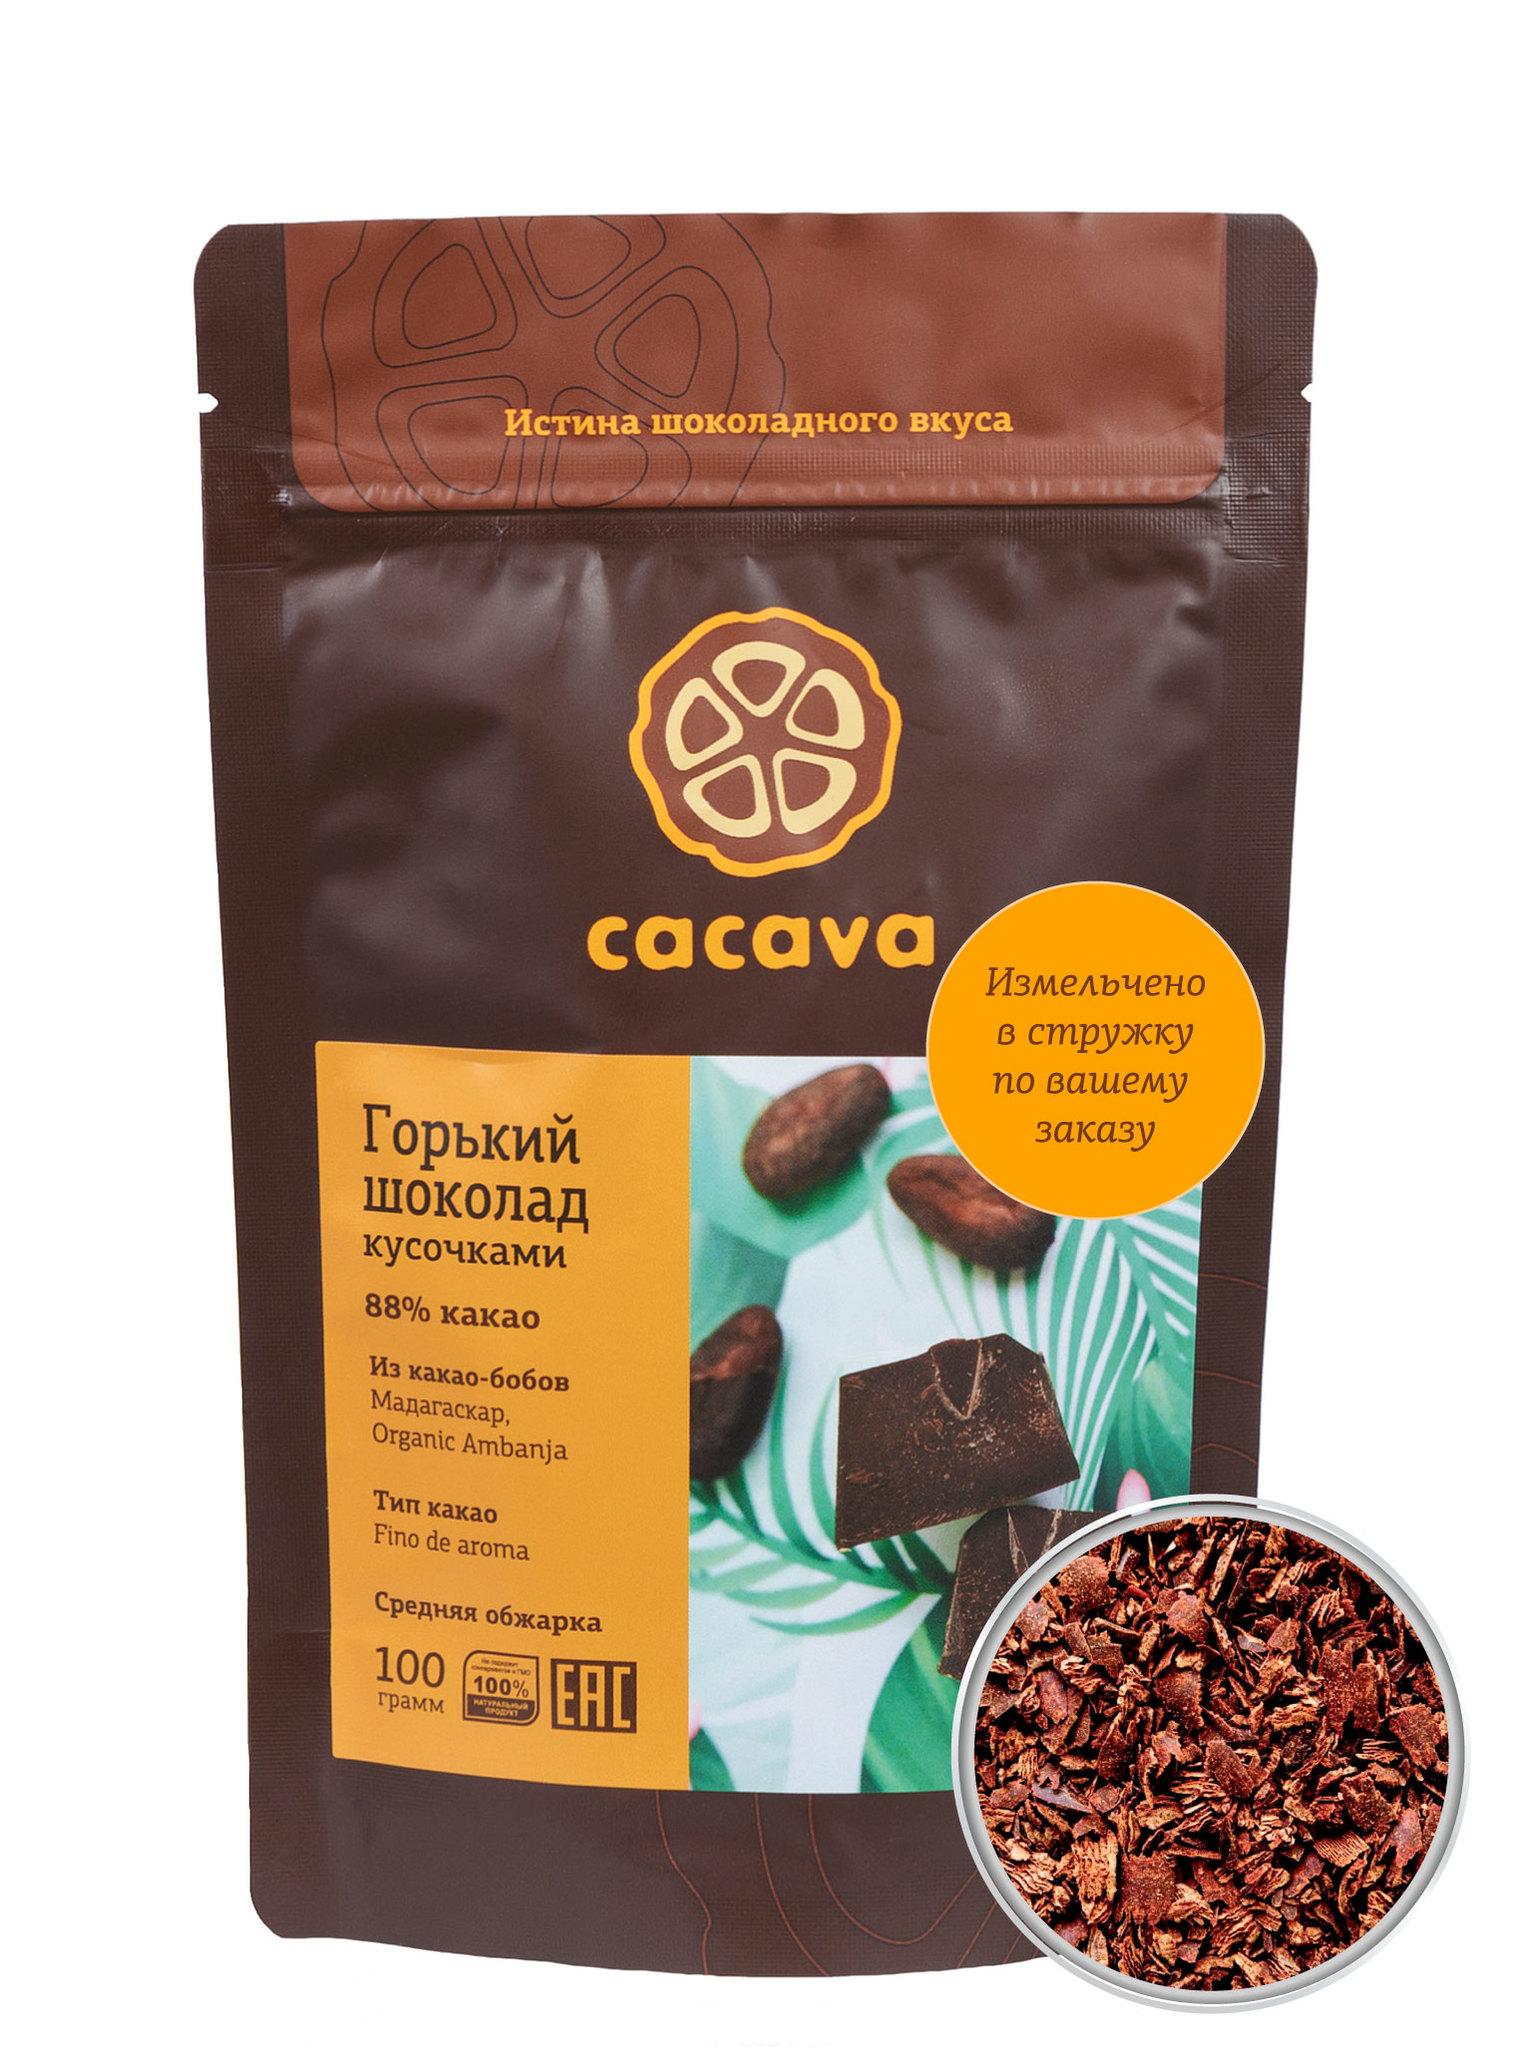 Горький шоколад 88 % какао в стружке  (Мадагаскар, Organic Ambanja), упаковка 100 грамм